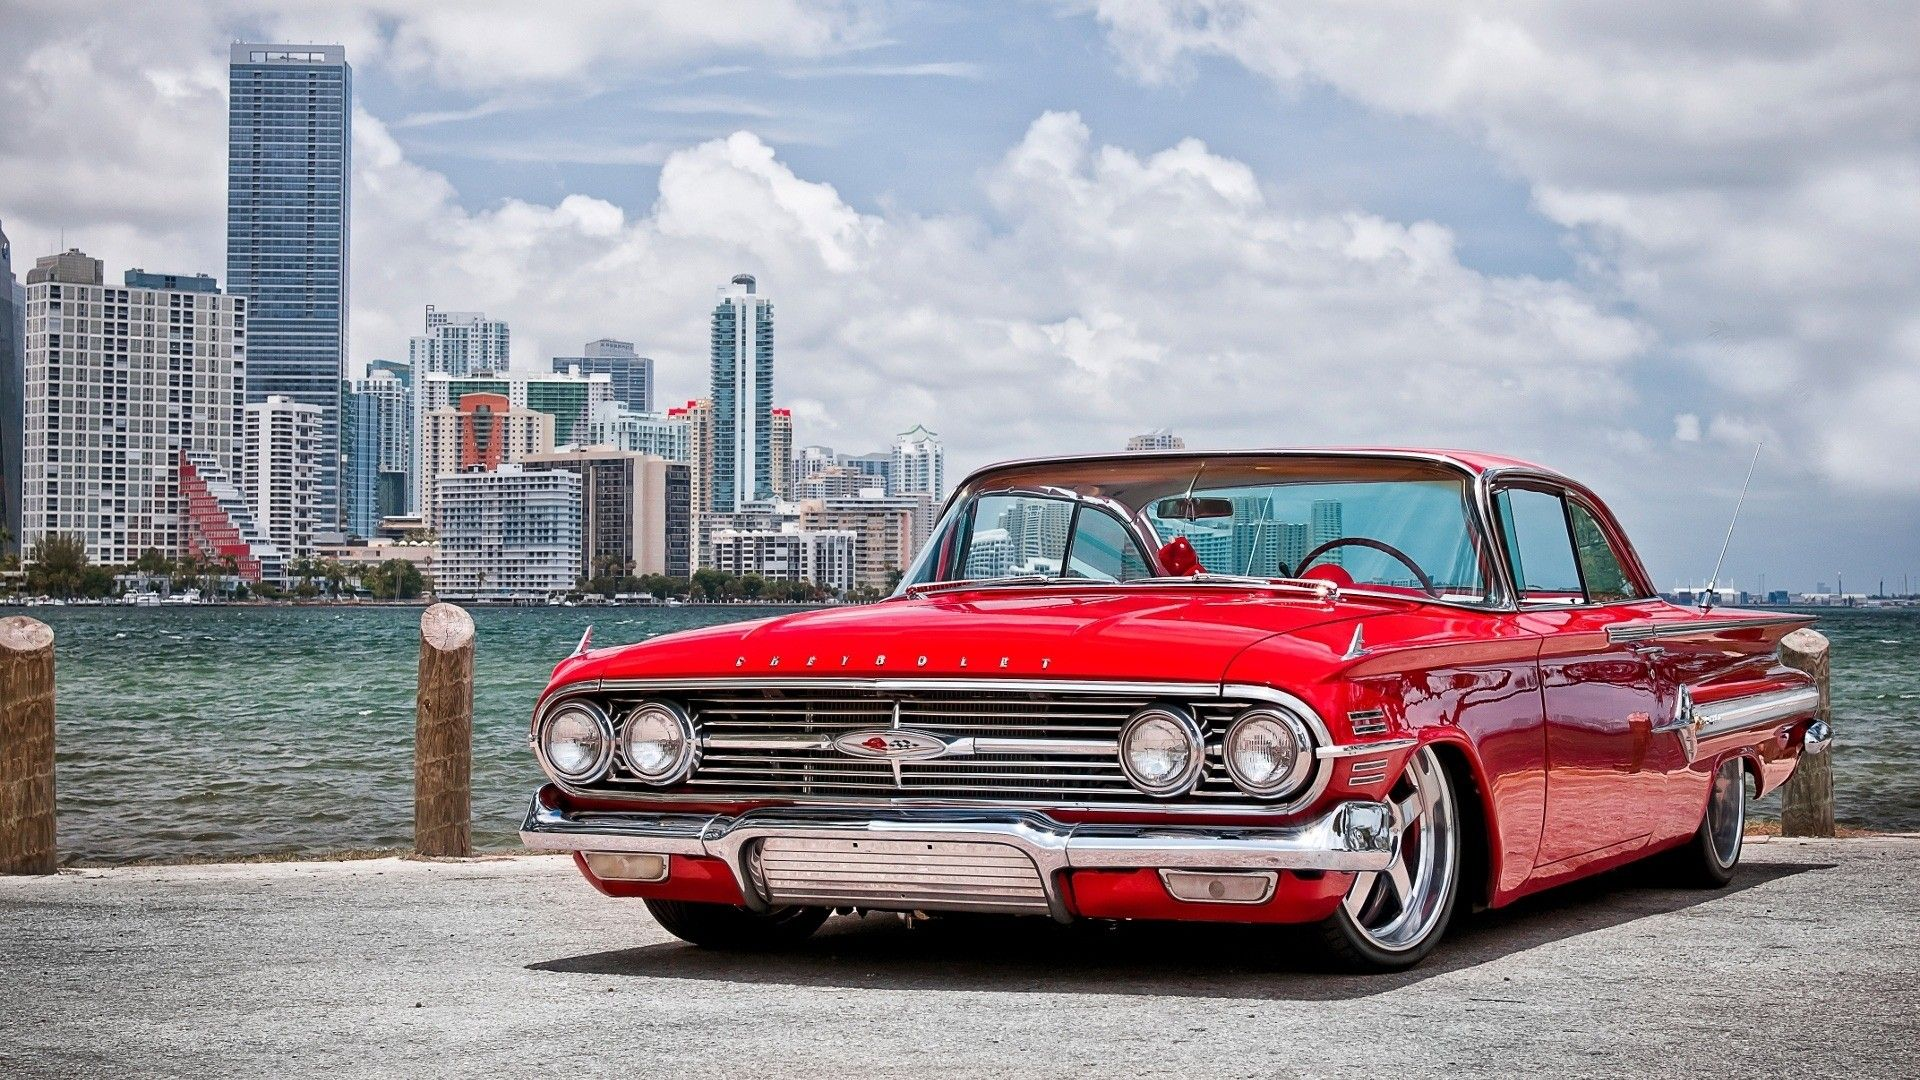 Our 1960 Chevy Impala Ride: 1960 Impala Big Block ( Matching) Edelbrock  RPMS Heads Edelbrock Intake Edelbrock